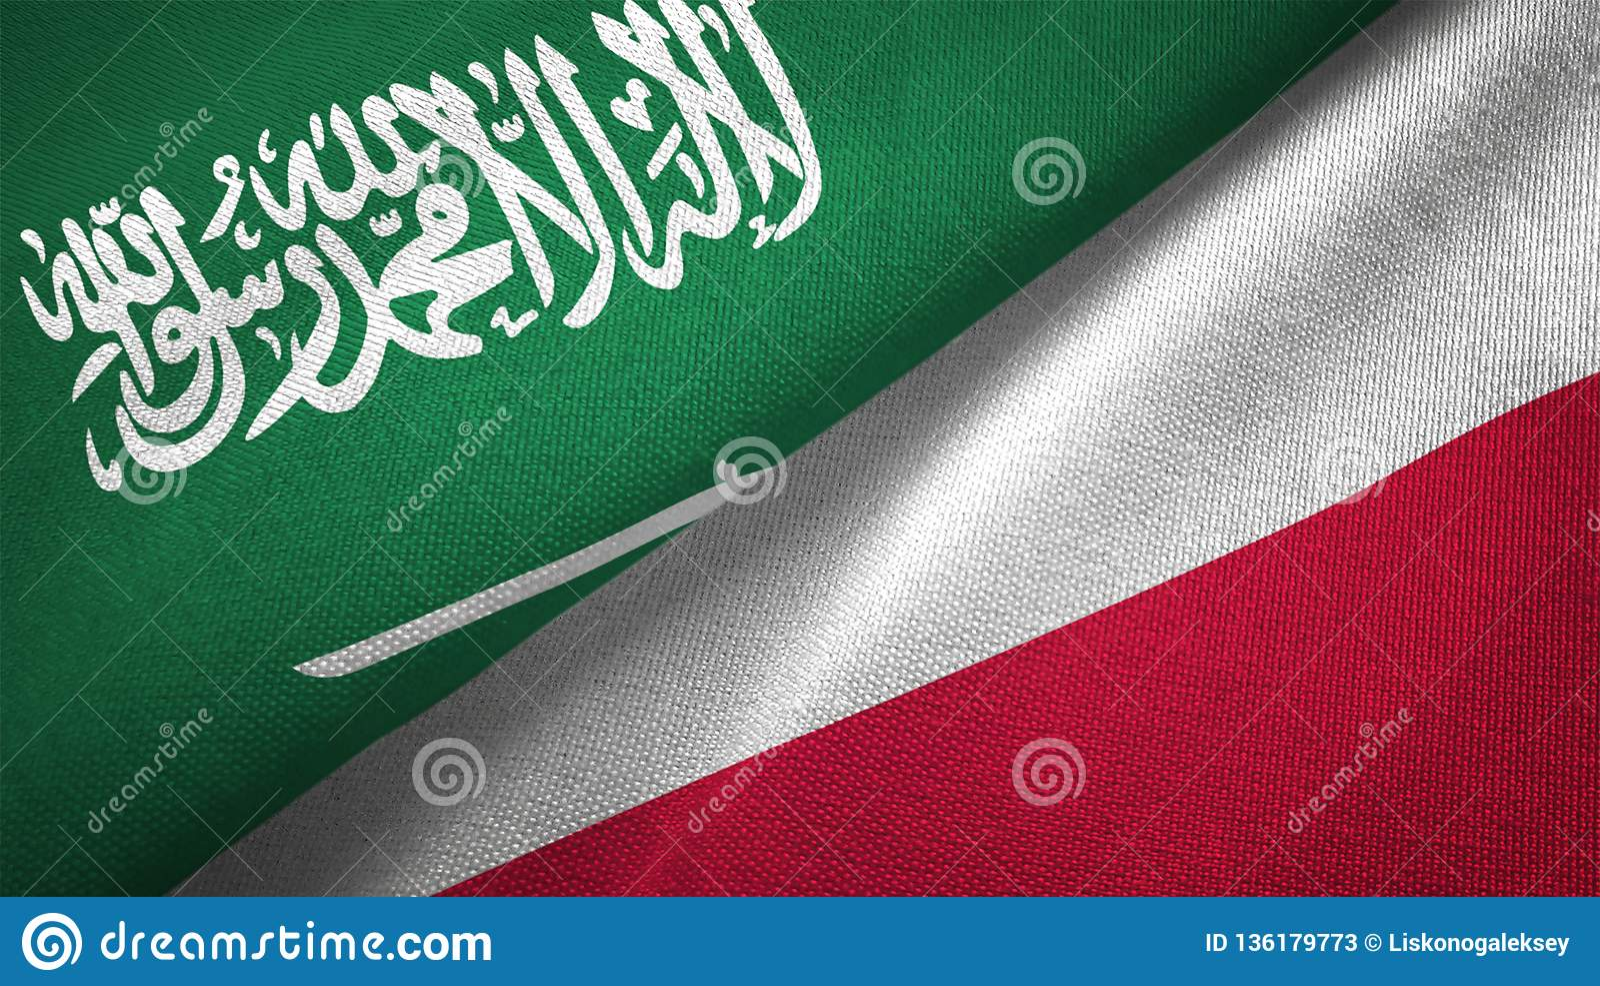 Poland and Saudi Arabia two flags textile cloth fabric texture